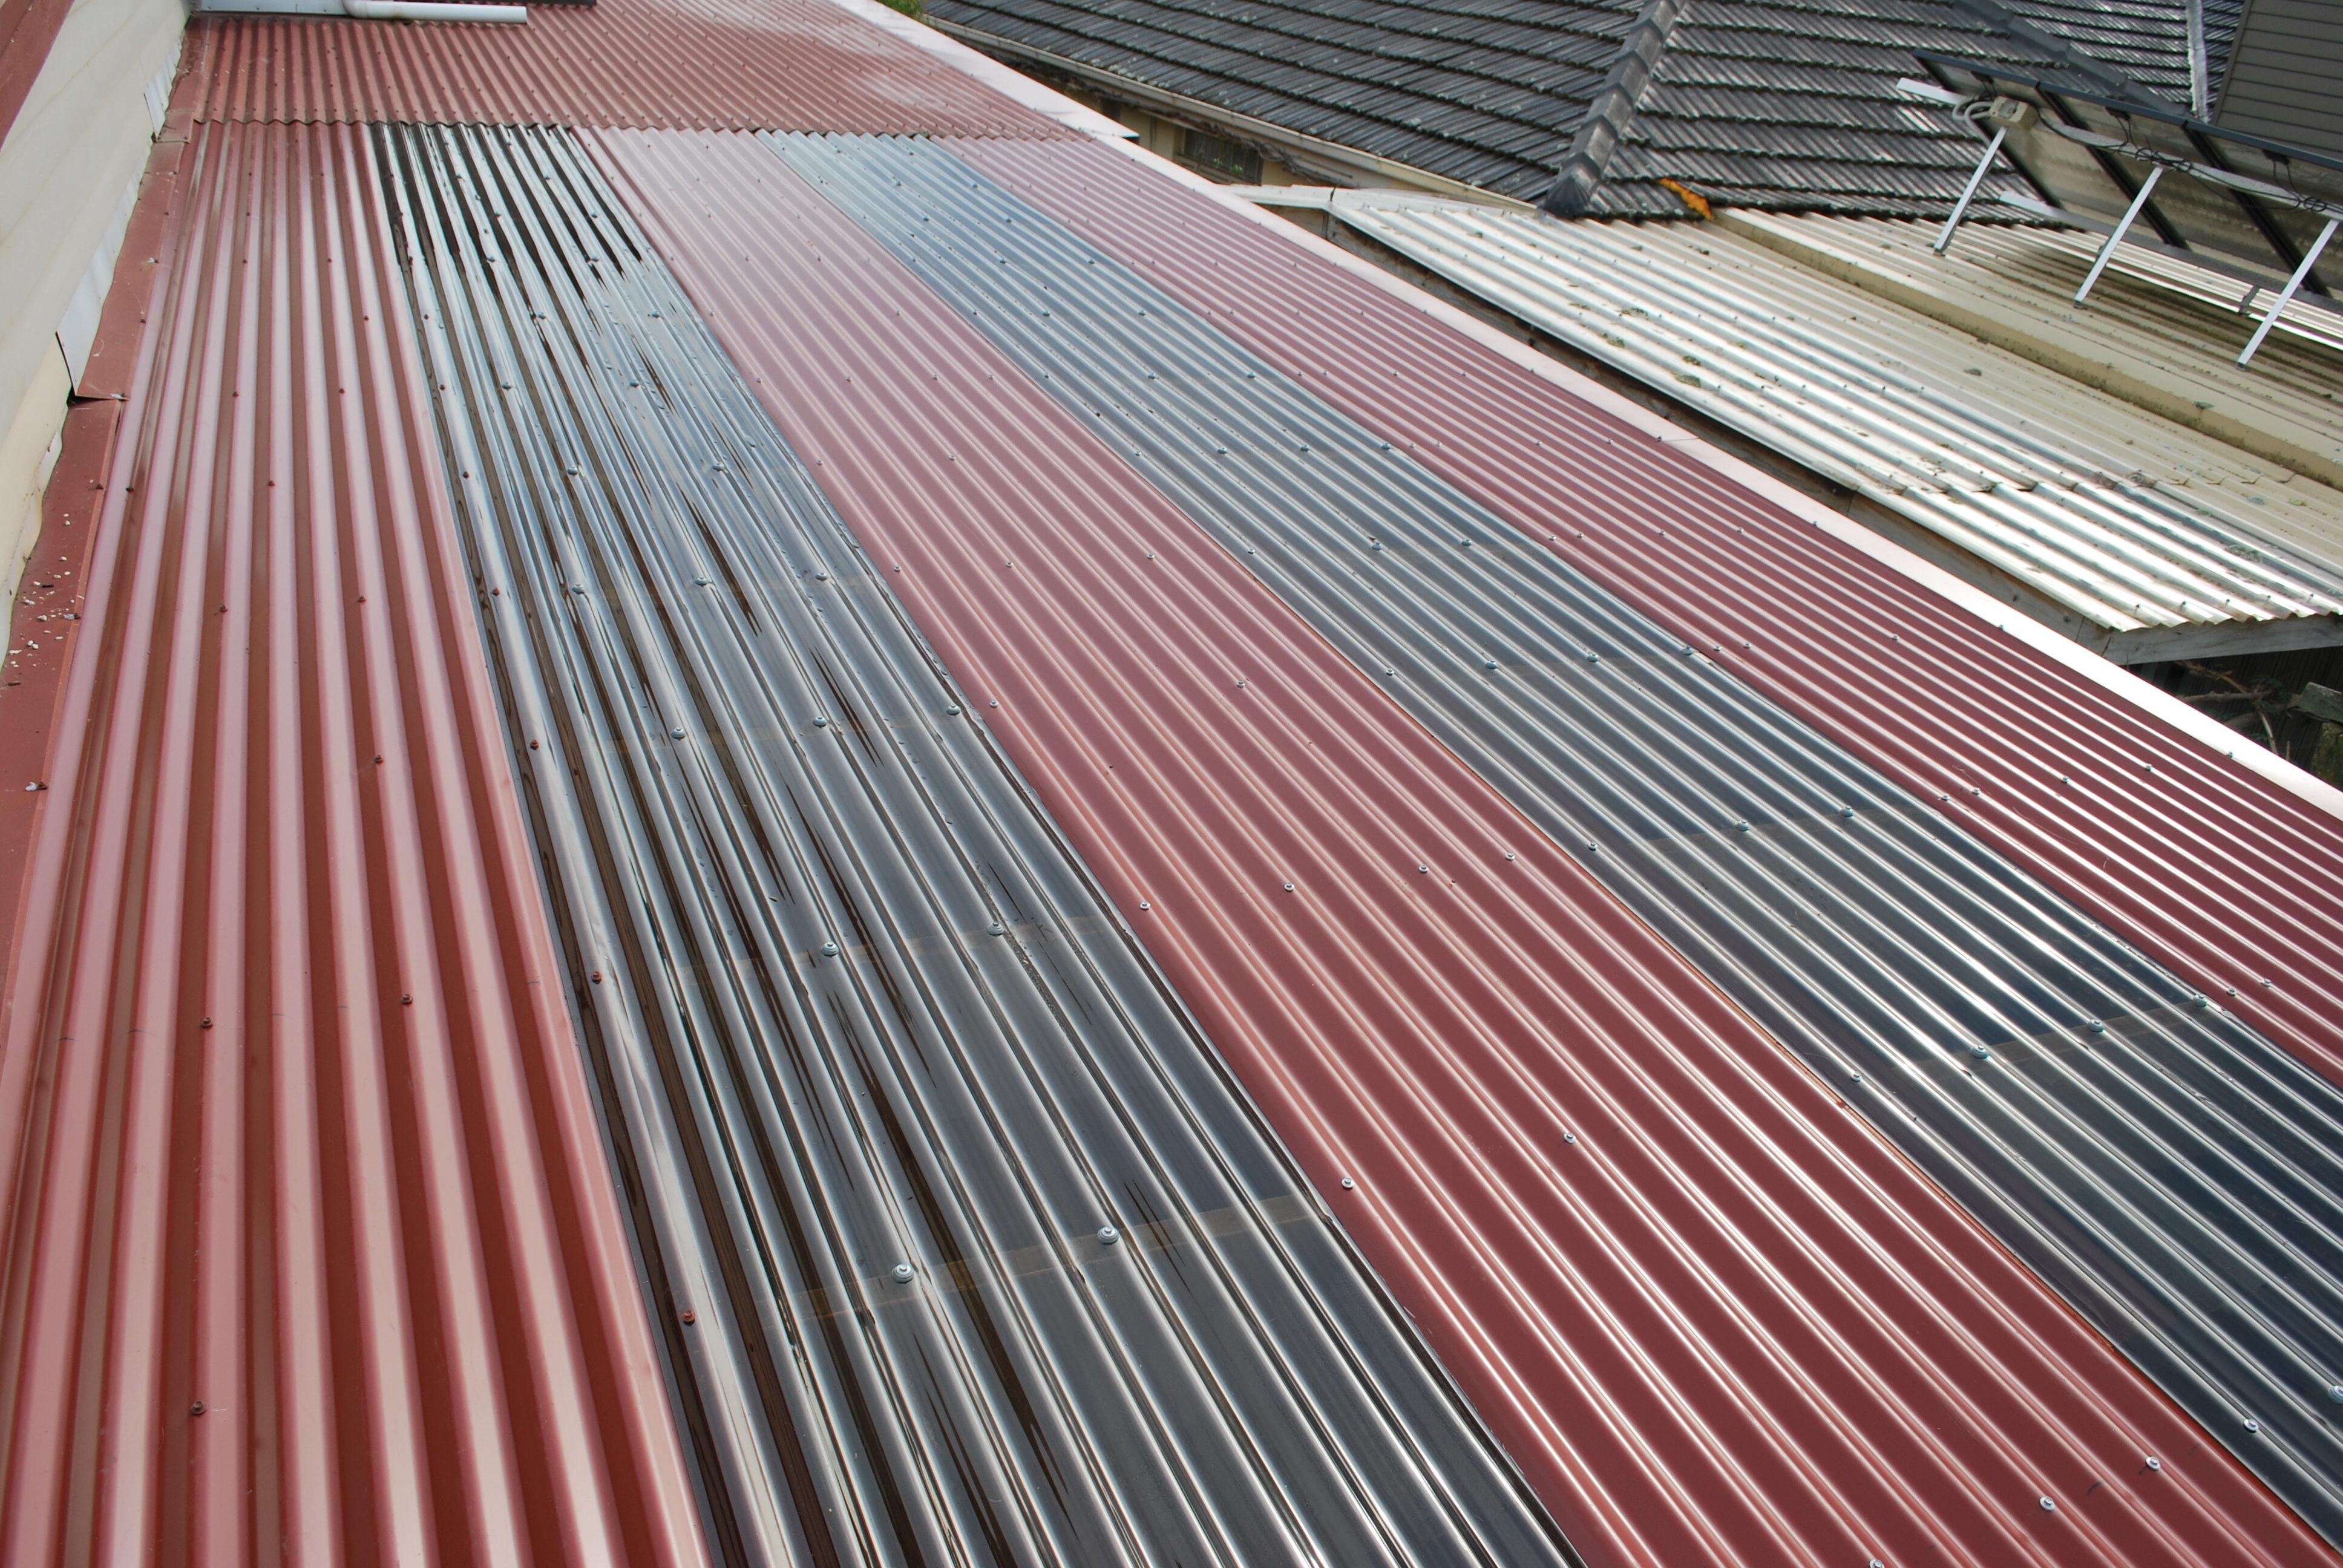 Veranda roof sheets replacement Hughsdale 3